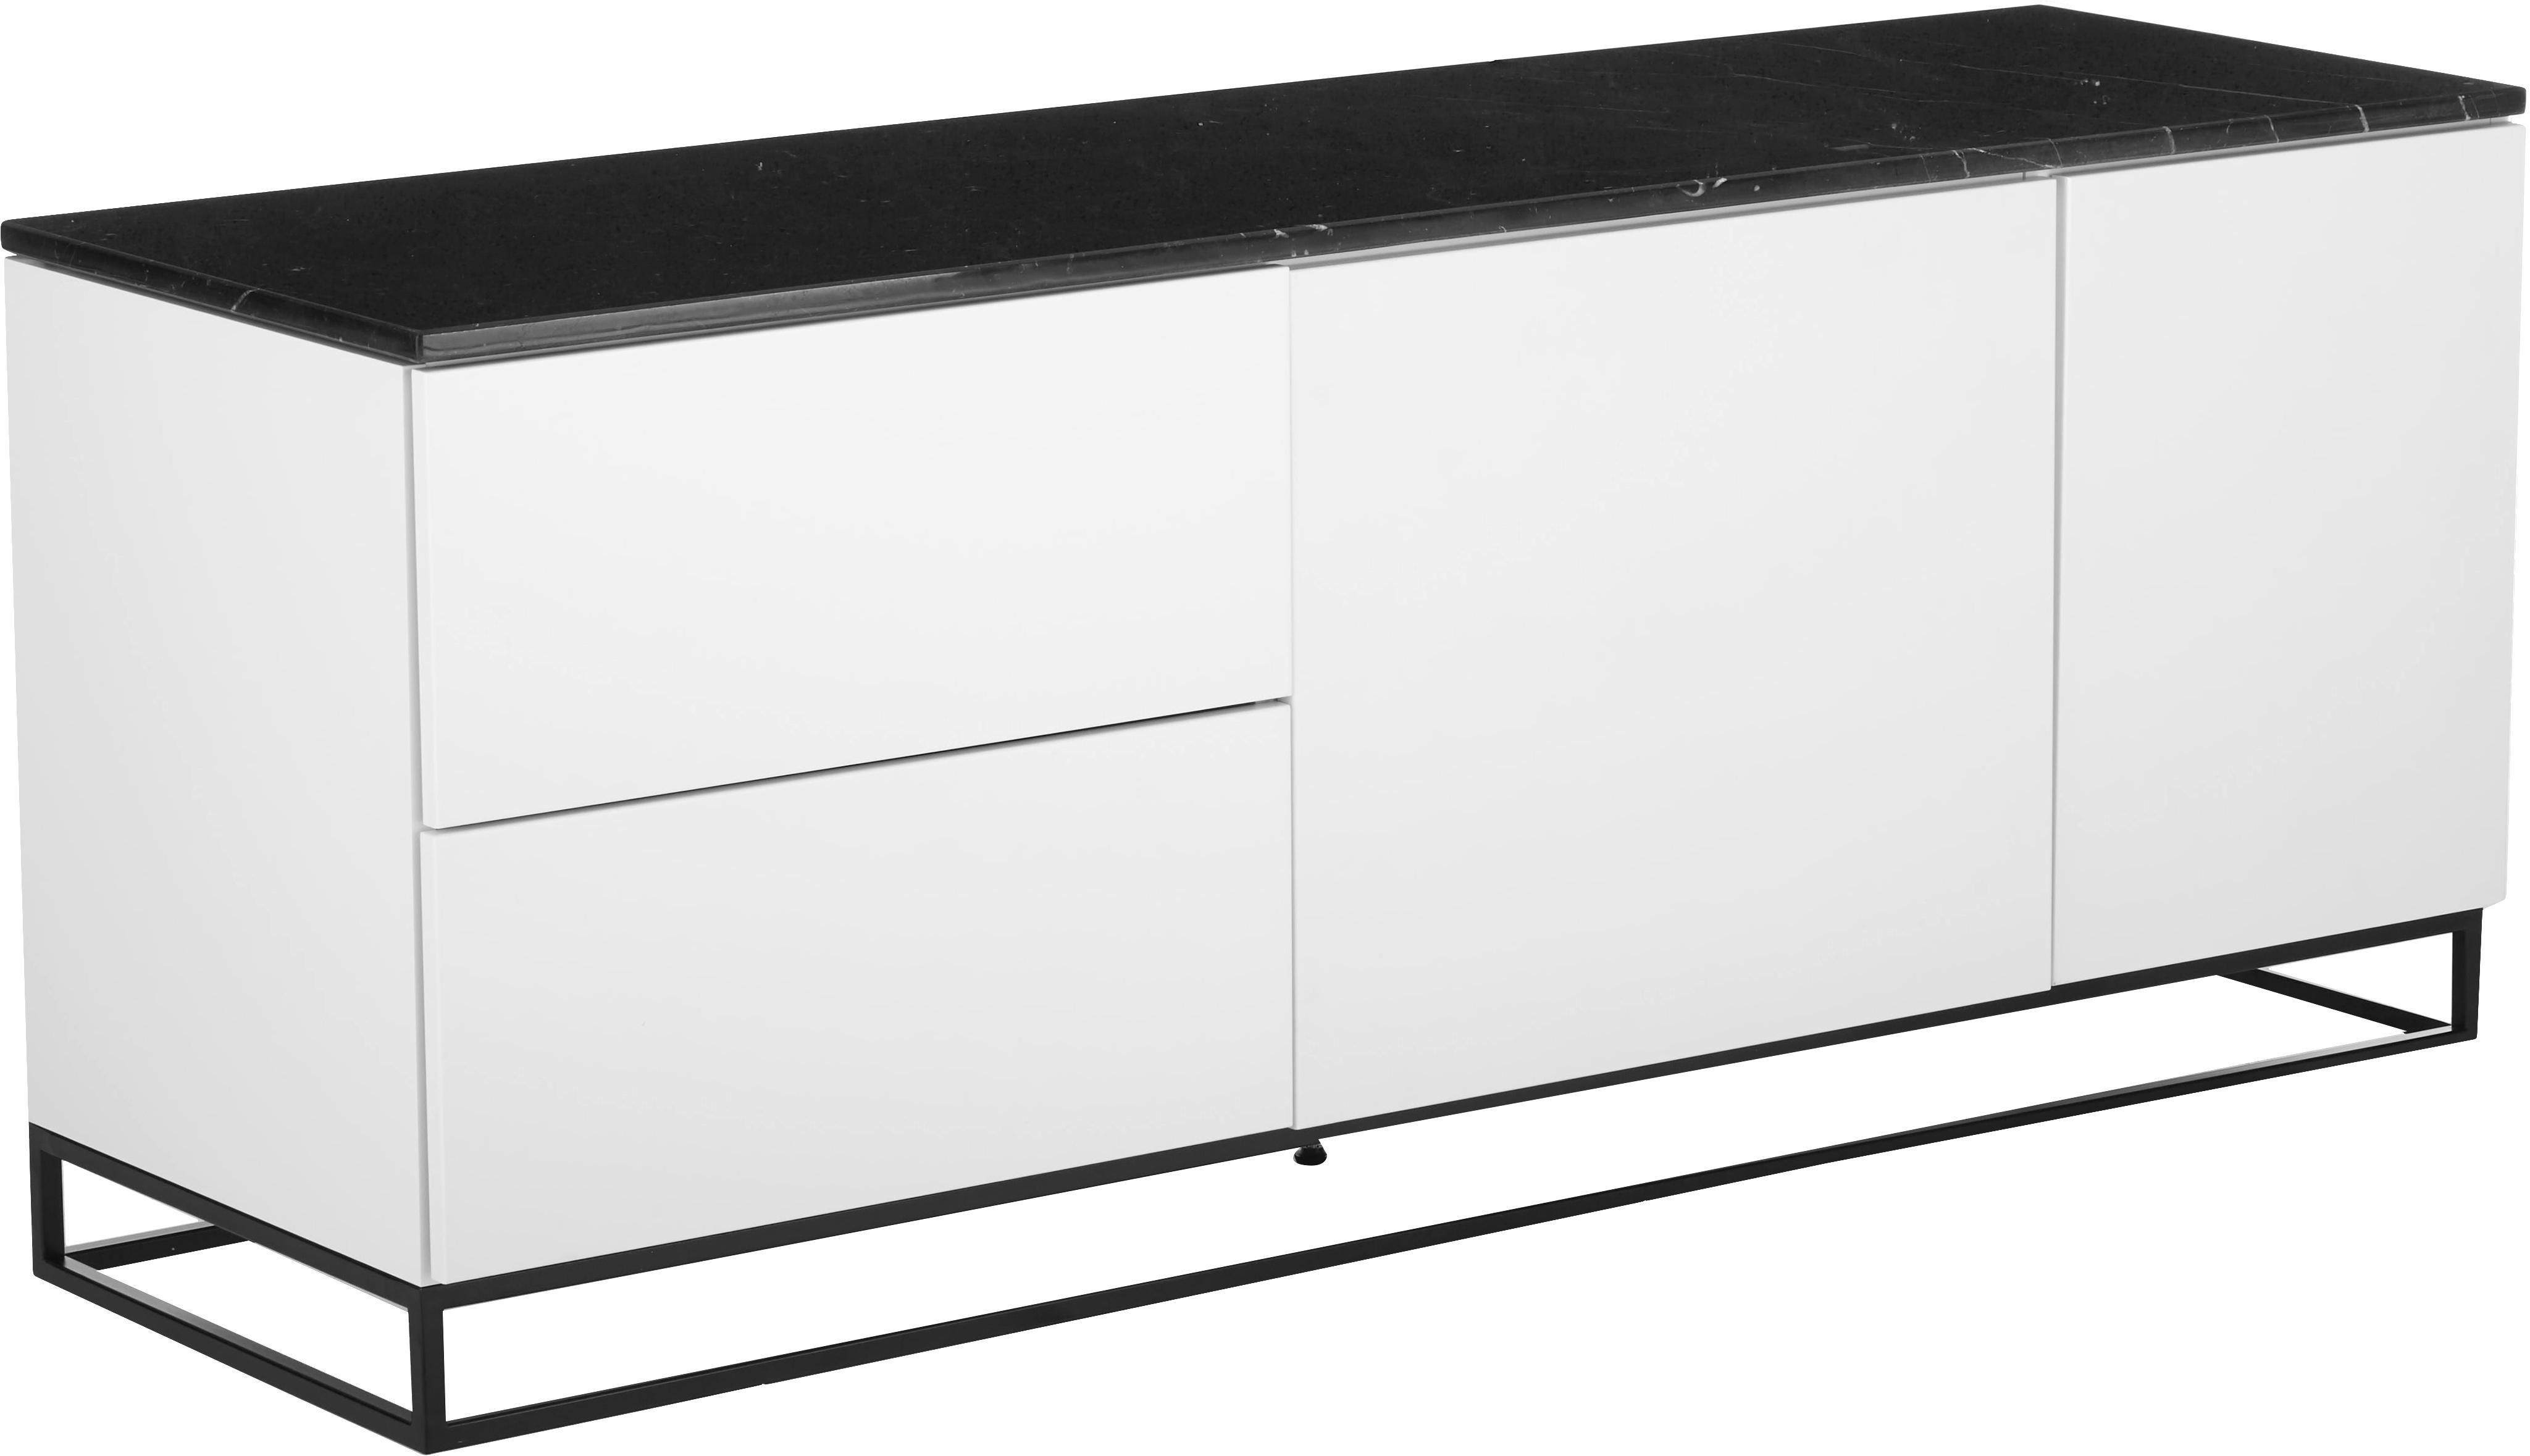 Dressoir Join met zwart marmeren blad, Plank: marmer, Frame: gelakt MDF, Poten: gelakt metaal, Wit, zwart, 160 x 66 cm